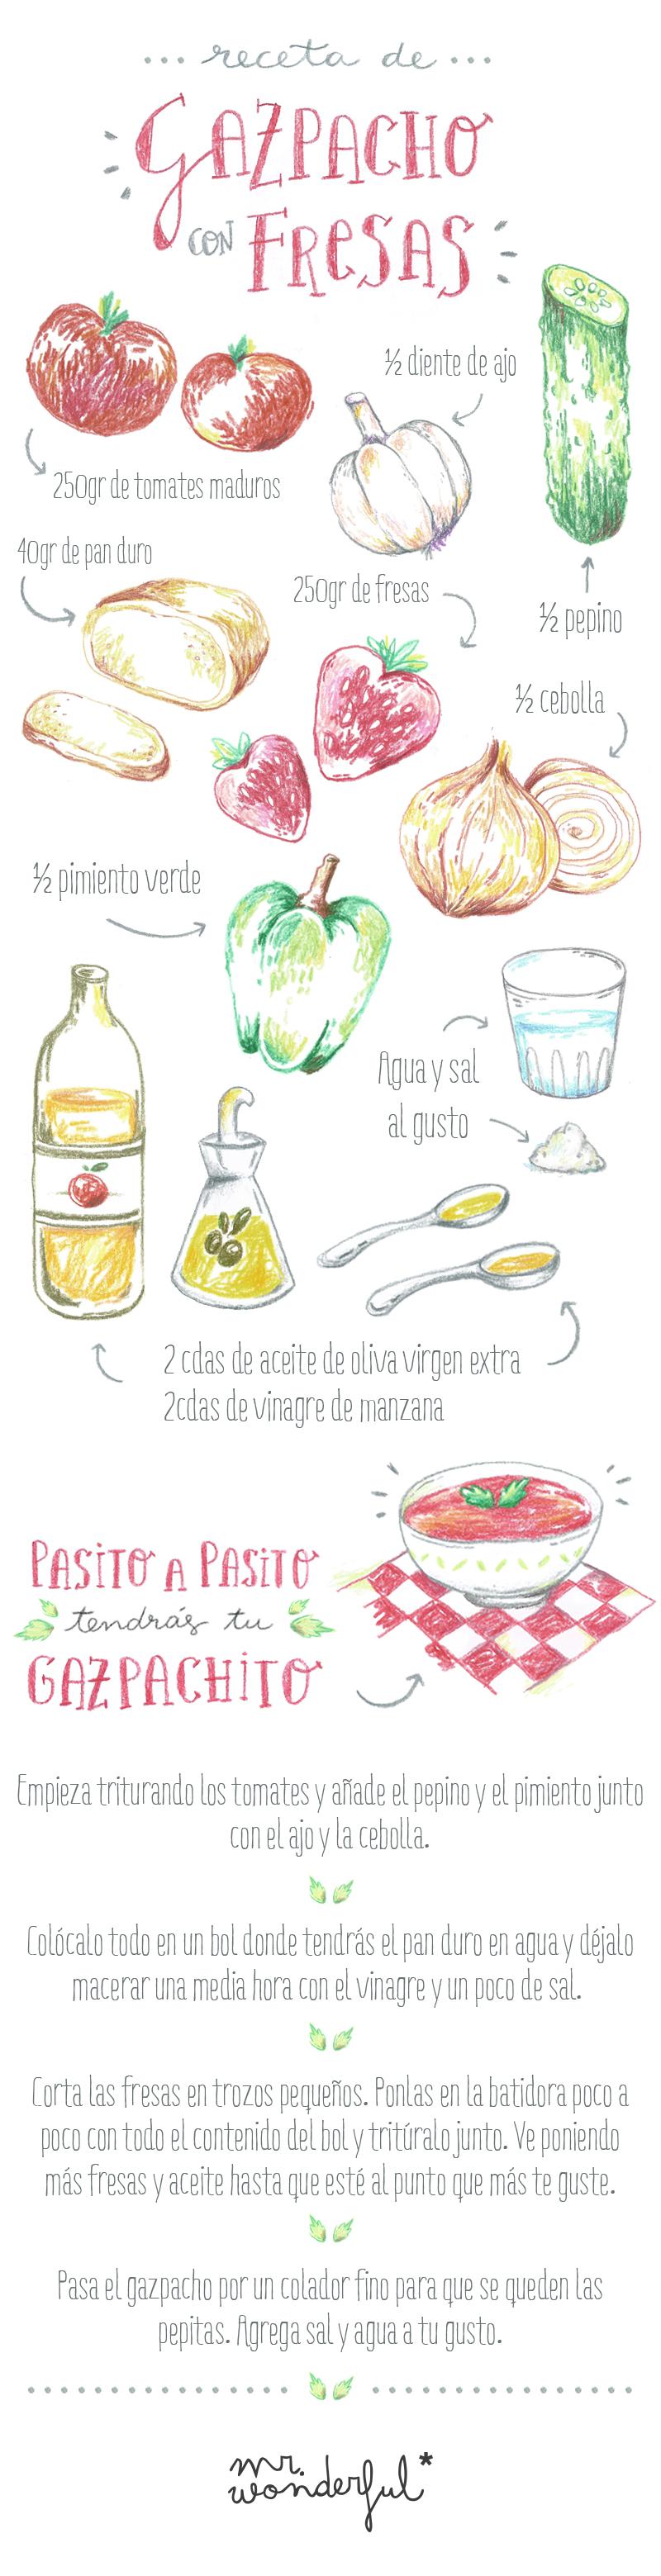 receta_gazpacho_800_v2